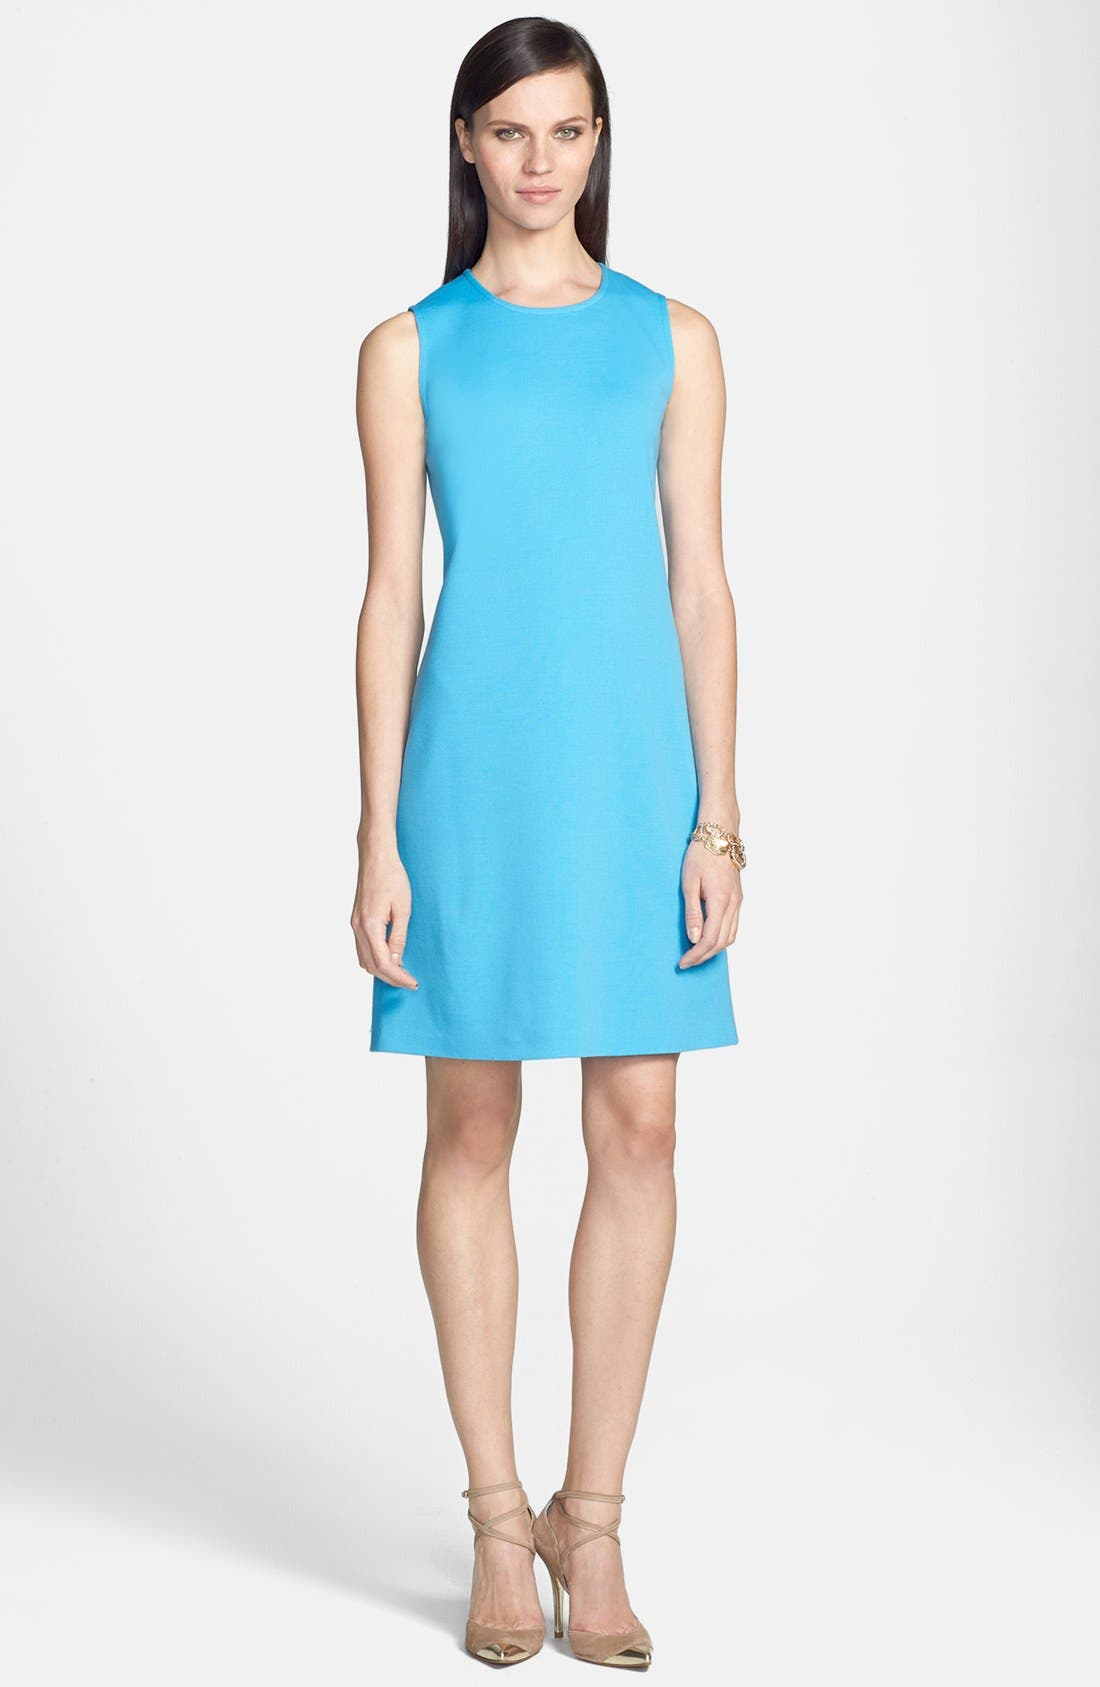 Main Image - St. John Collection Milano Knit Jewel Neck Trapeze Dress